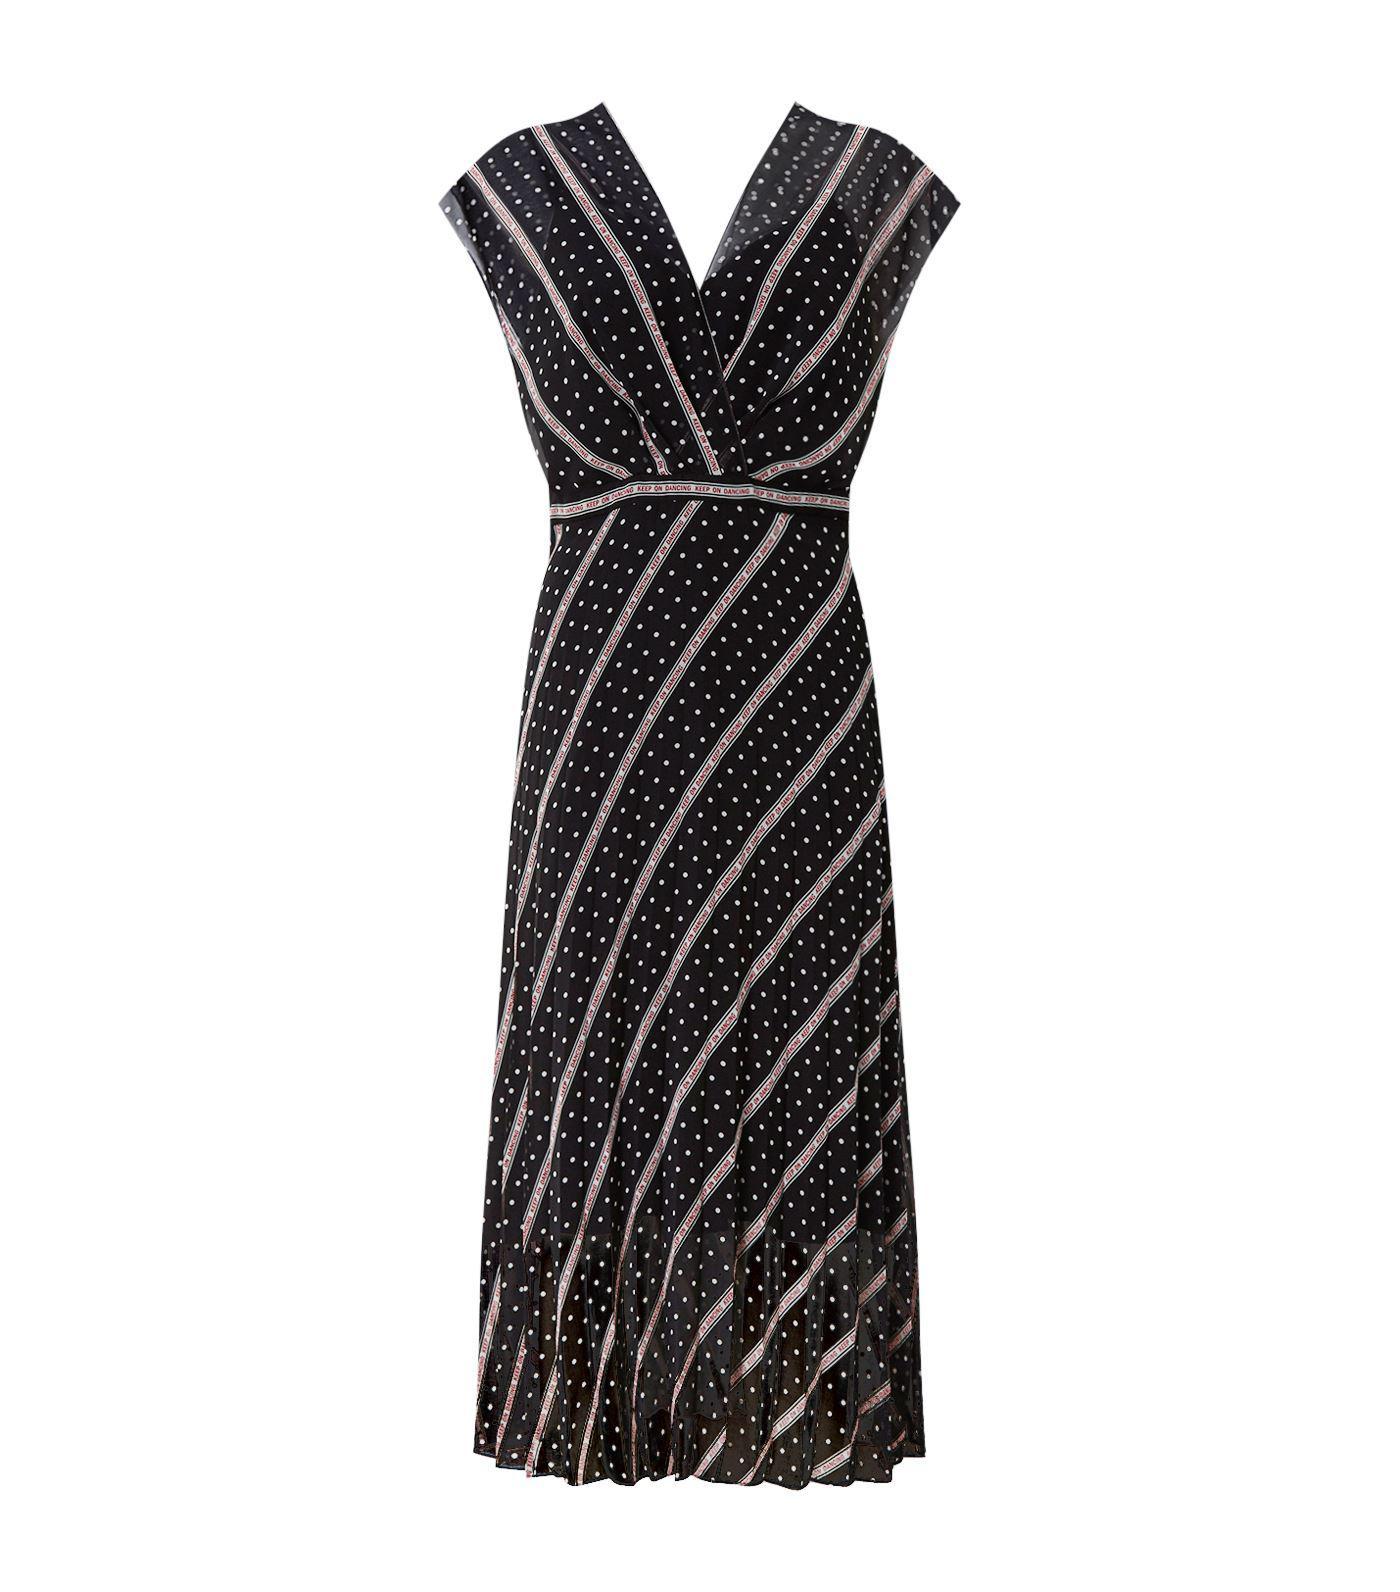 66747f5eeb5 Sandro Keep On Dancing Dress in Black - Lyst